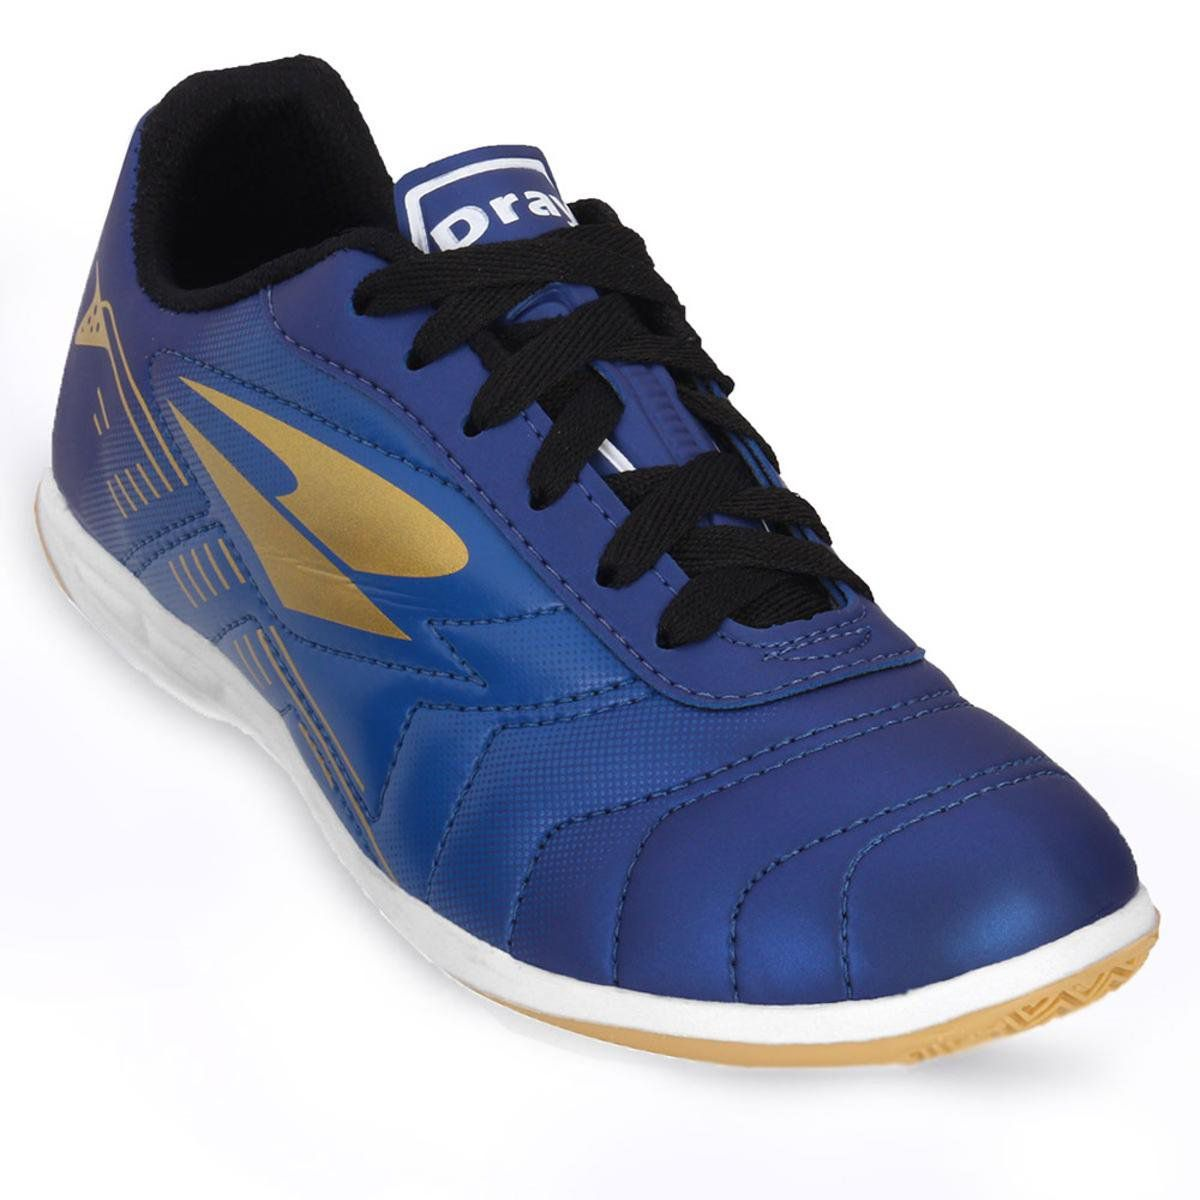 Chuteira Infantil Dray 308 Indoor Futsal - Marinho / Ouro